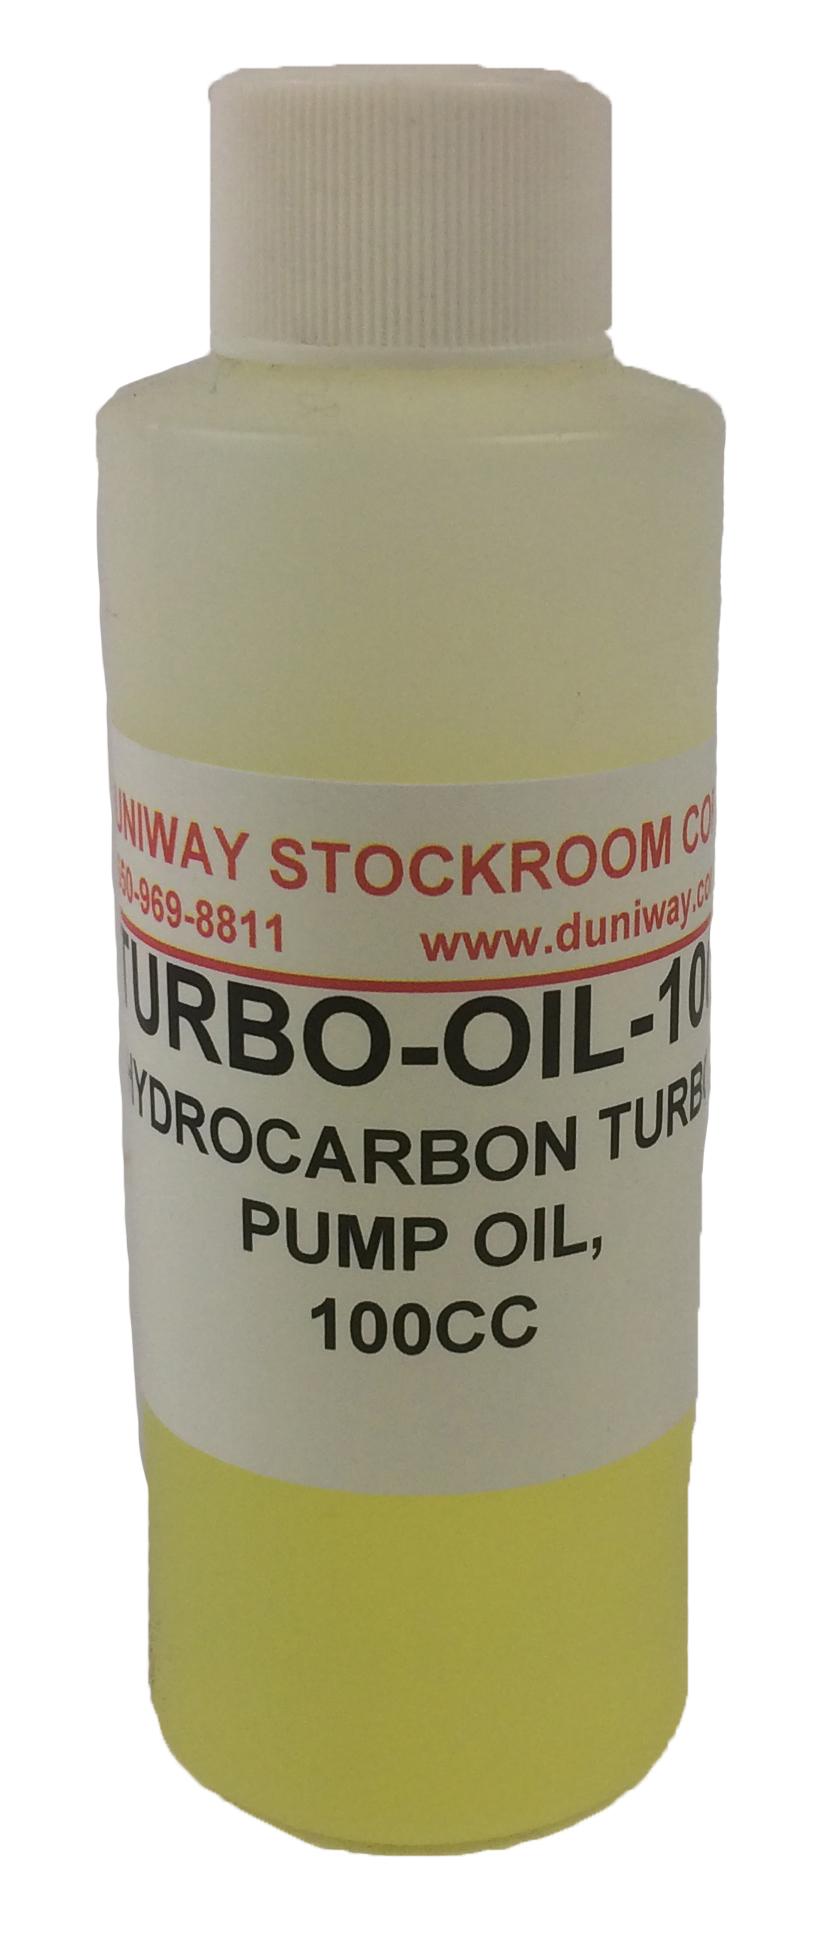 Hydrocarbon Turbo Pump Oil, 100cc | DUNIWAY